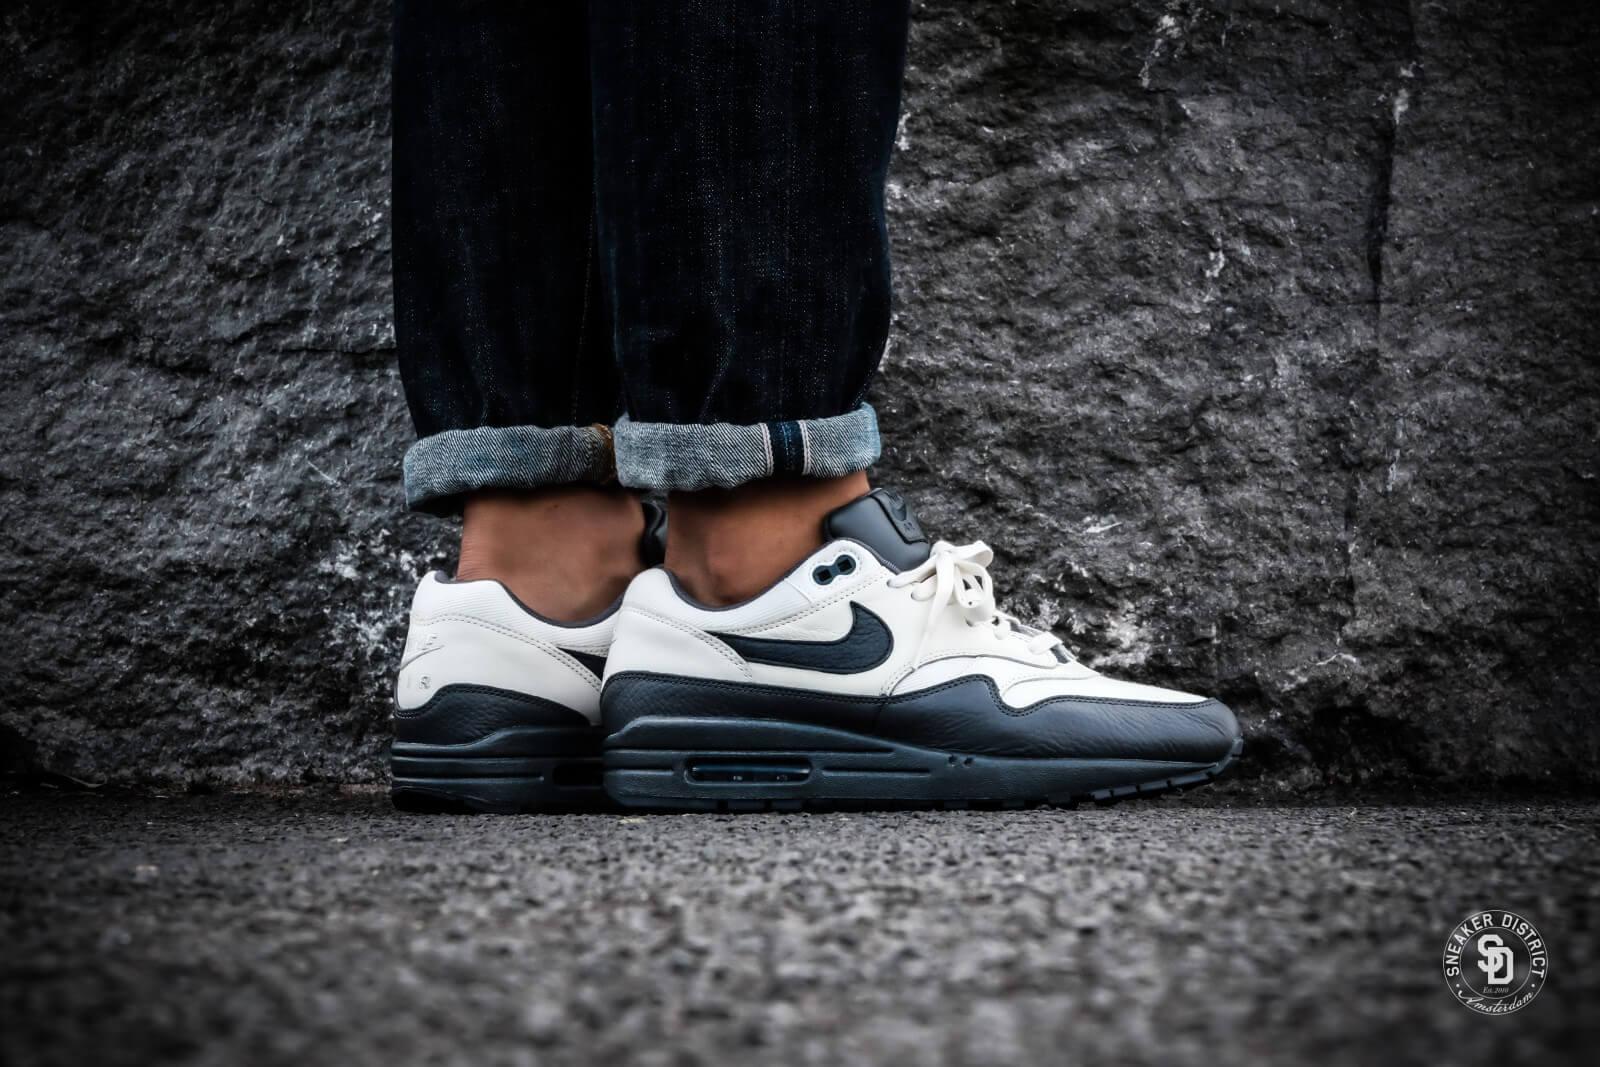 Nike Air Max 1 Premium Dark Obsidian Le Site de la Sneaker